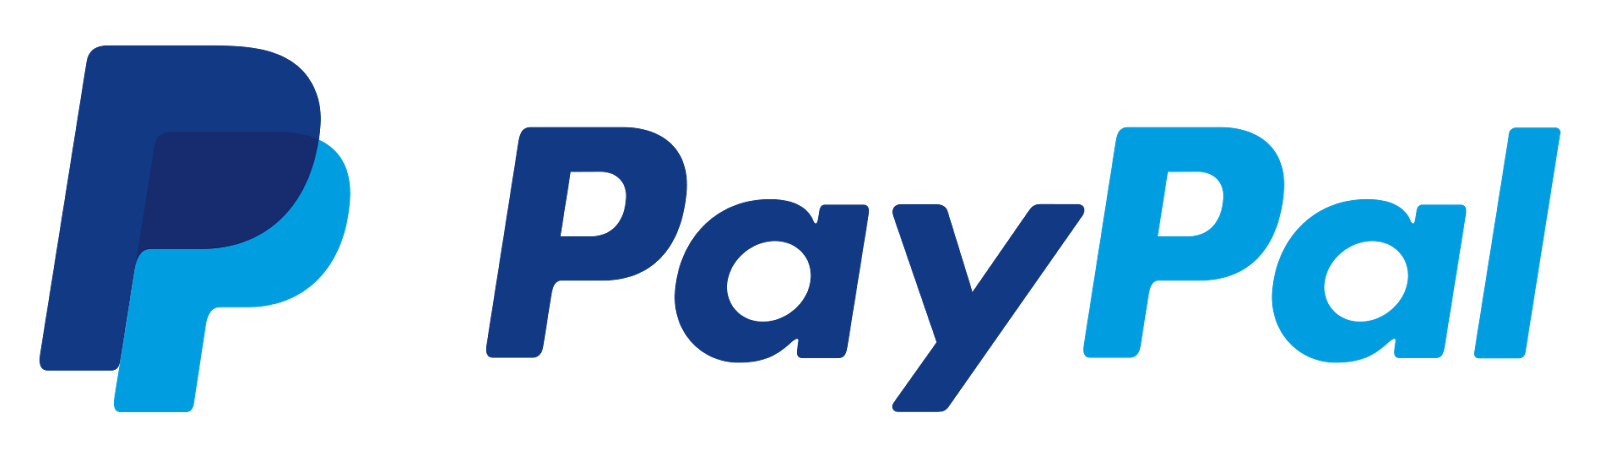 Paypal Logo Transparent png format large size